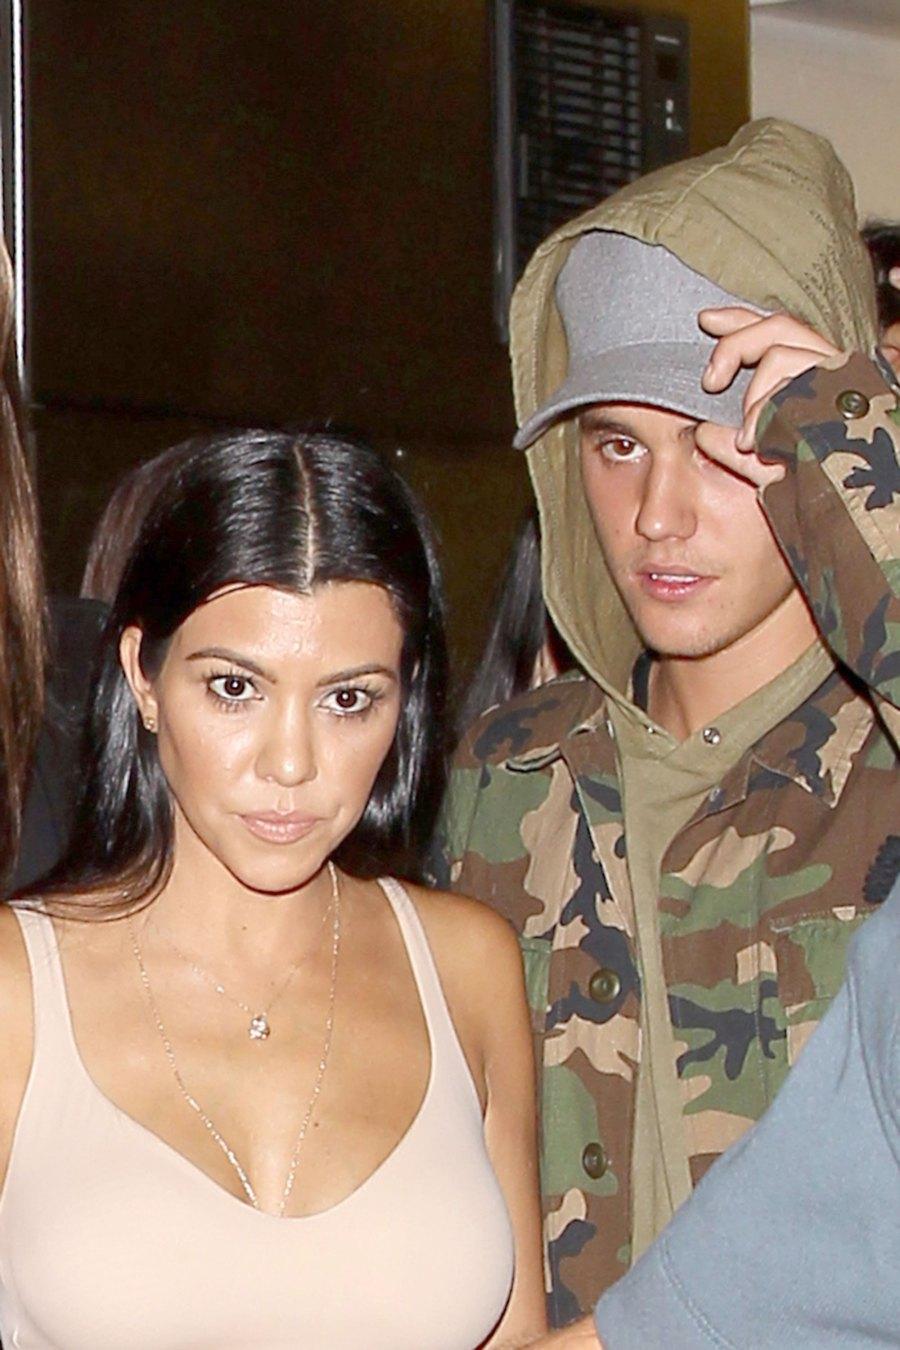 Justin and Kourtney Kardashian